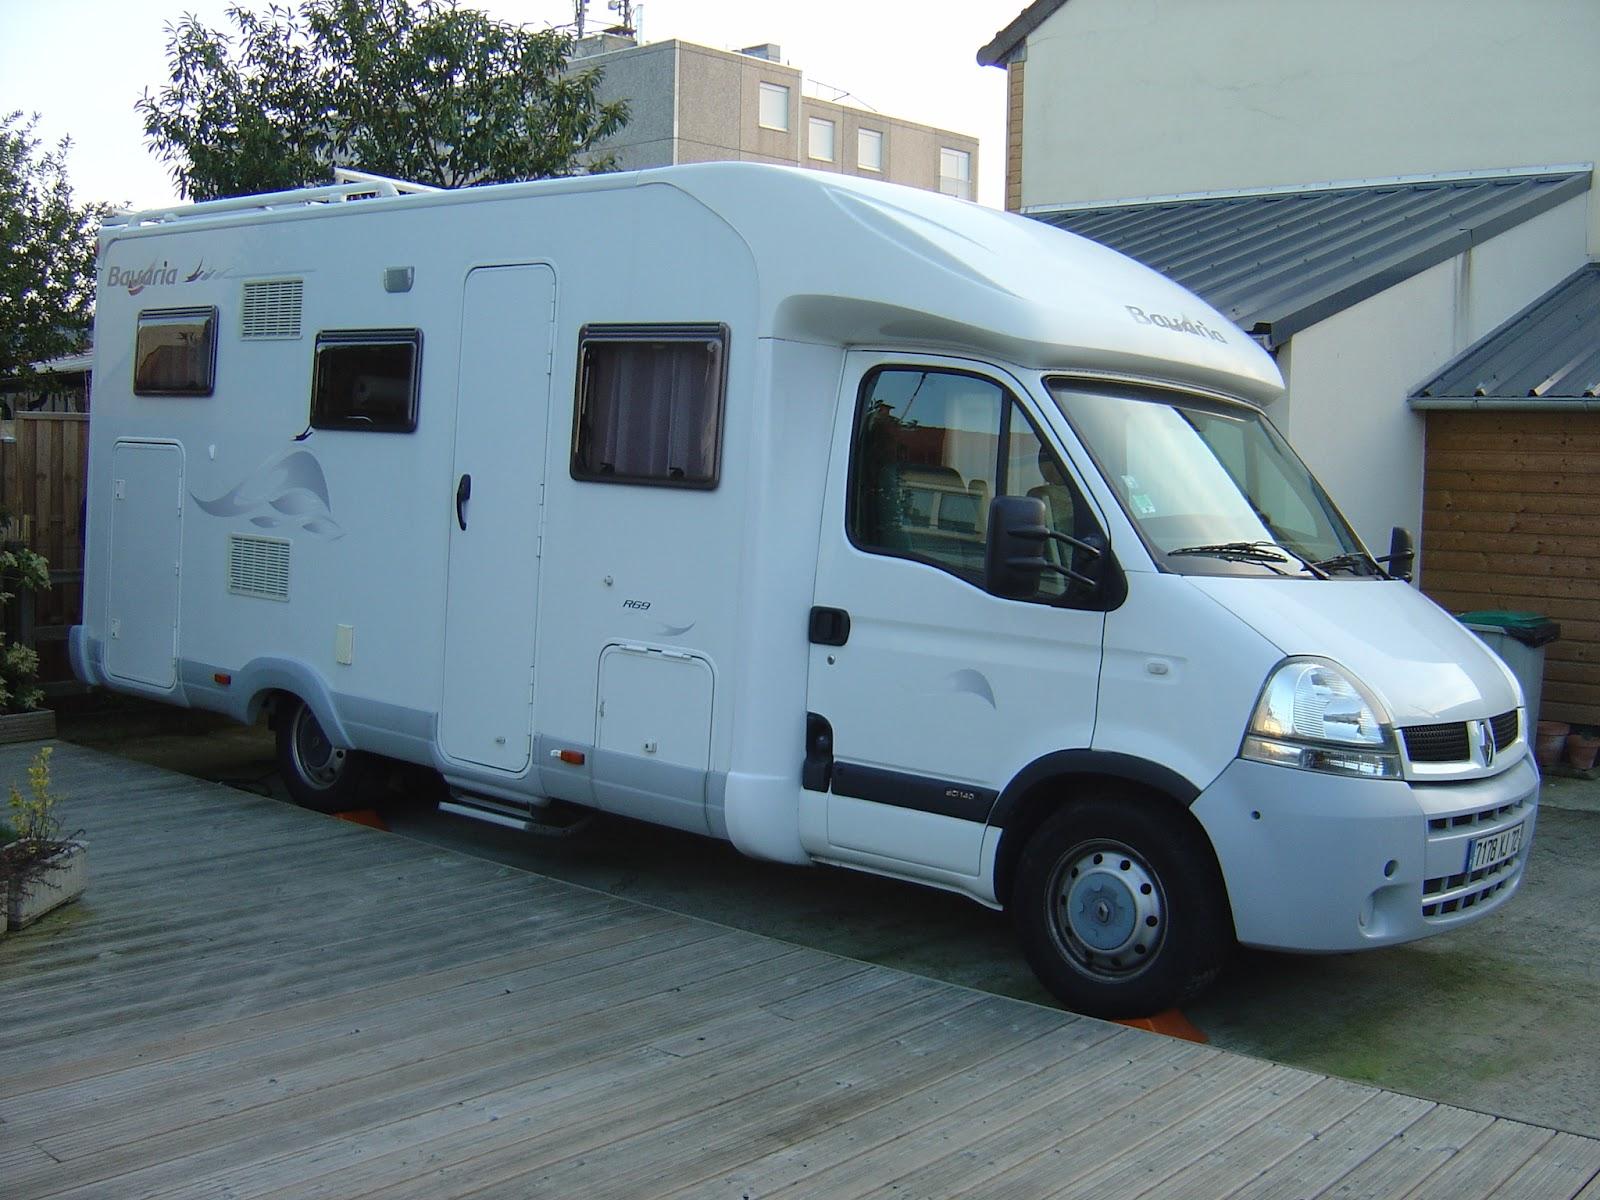 camping car bavaria r69 caract ristiques bavaria profil r69fg renault master 3l turbo. Black Bedroom Furniture Sets. Home Design Ideas